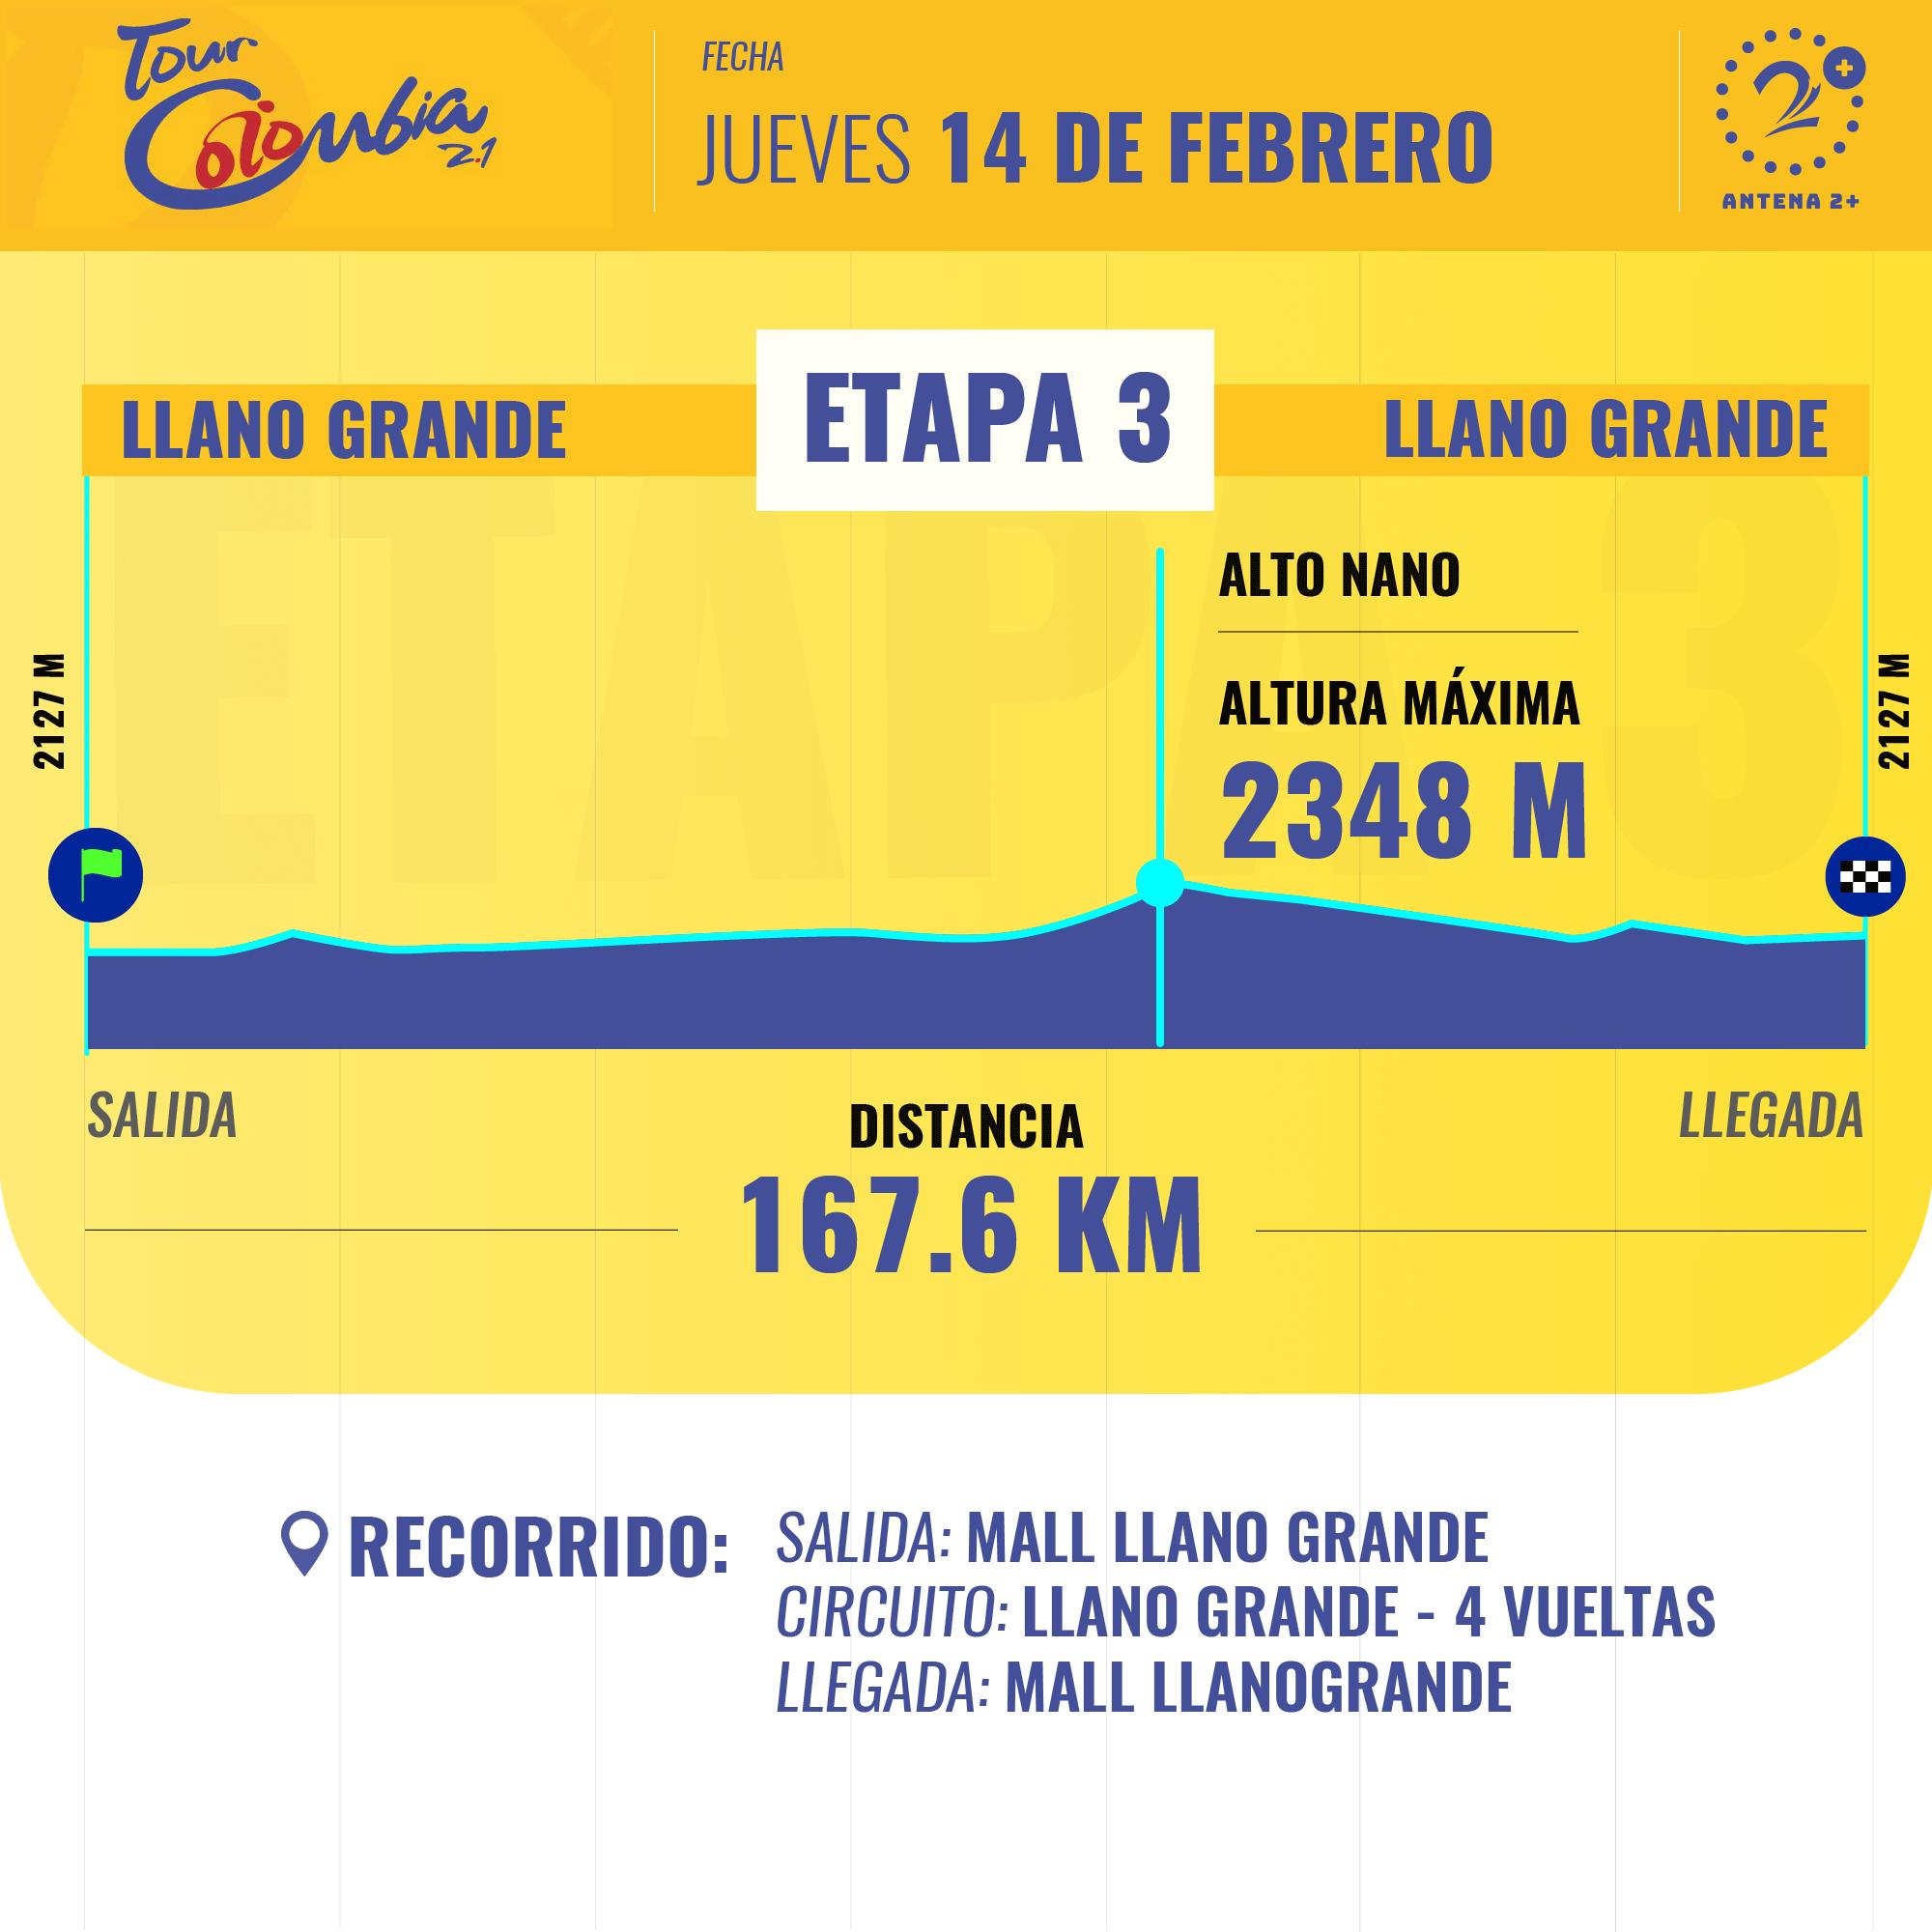 Tour Colombia y la tercera etapa de este jueves